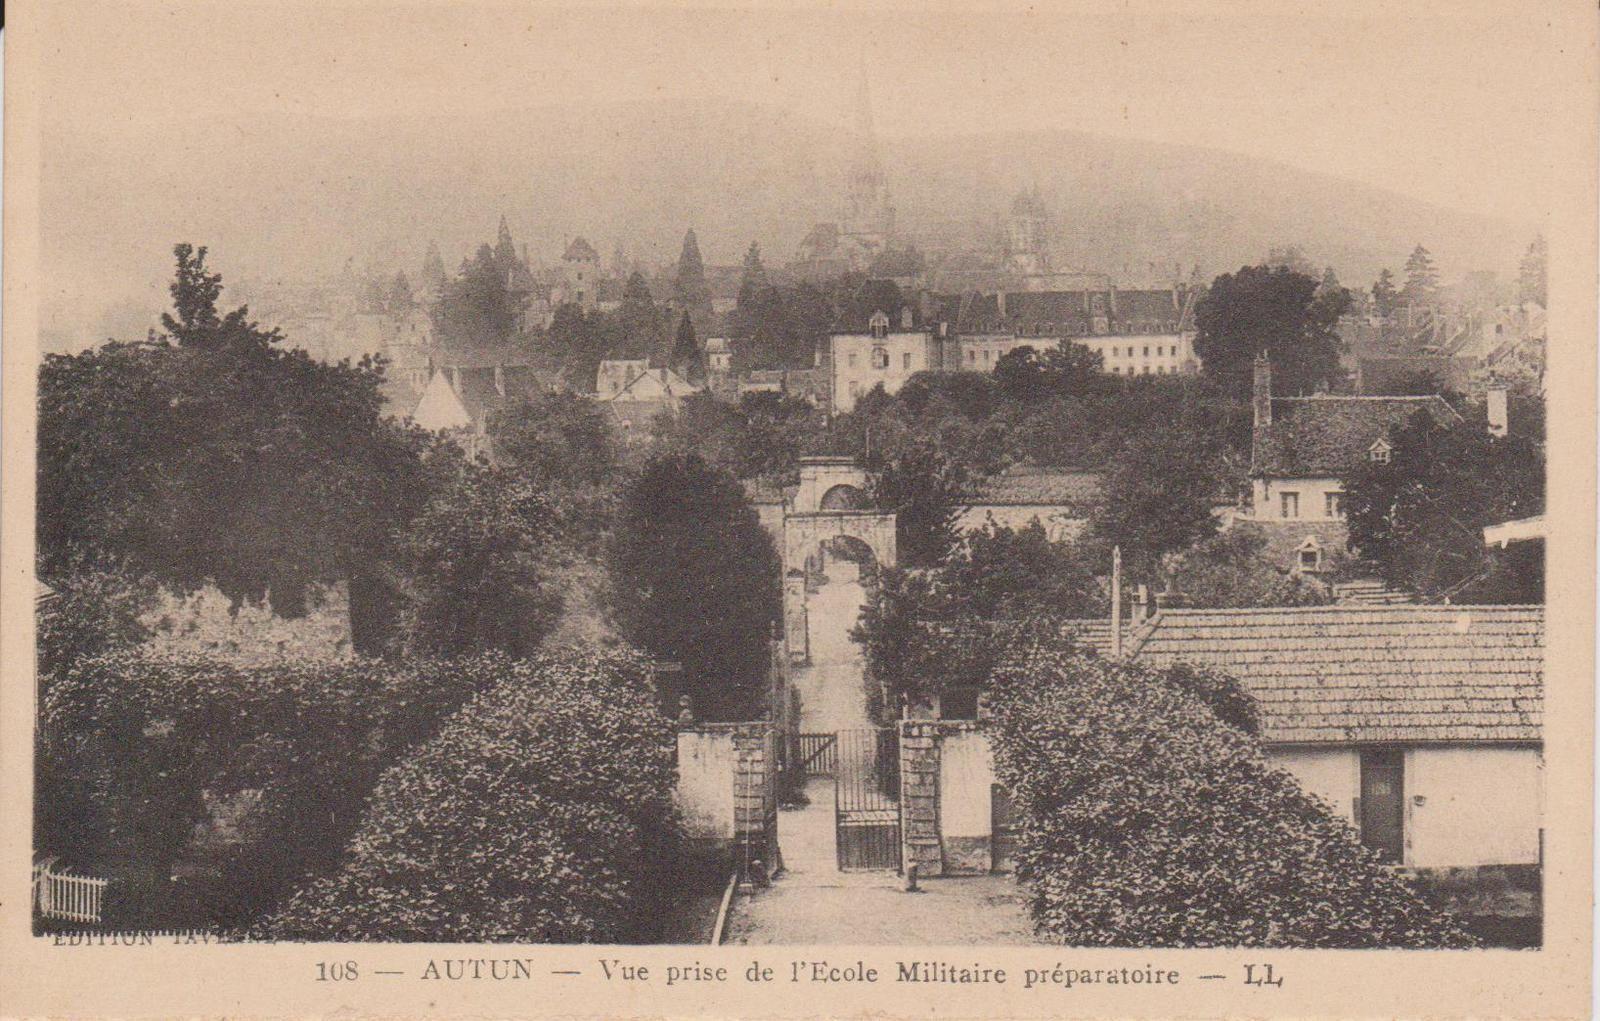 Lycée Militaire d'Autun - 71400 Autun